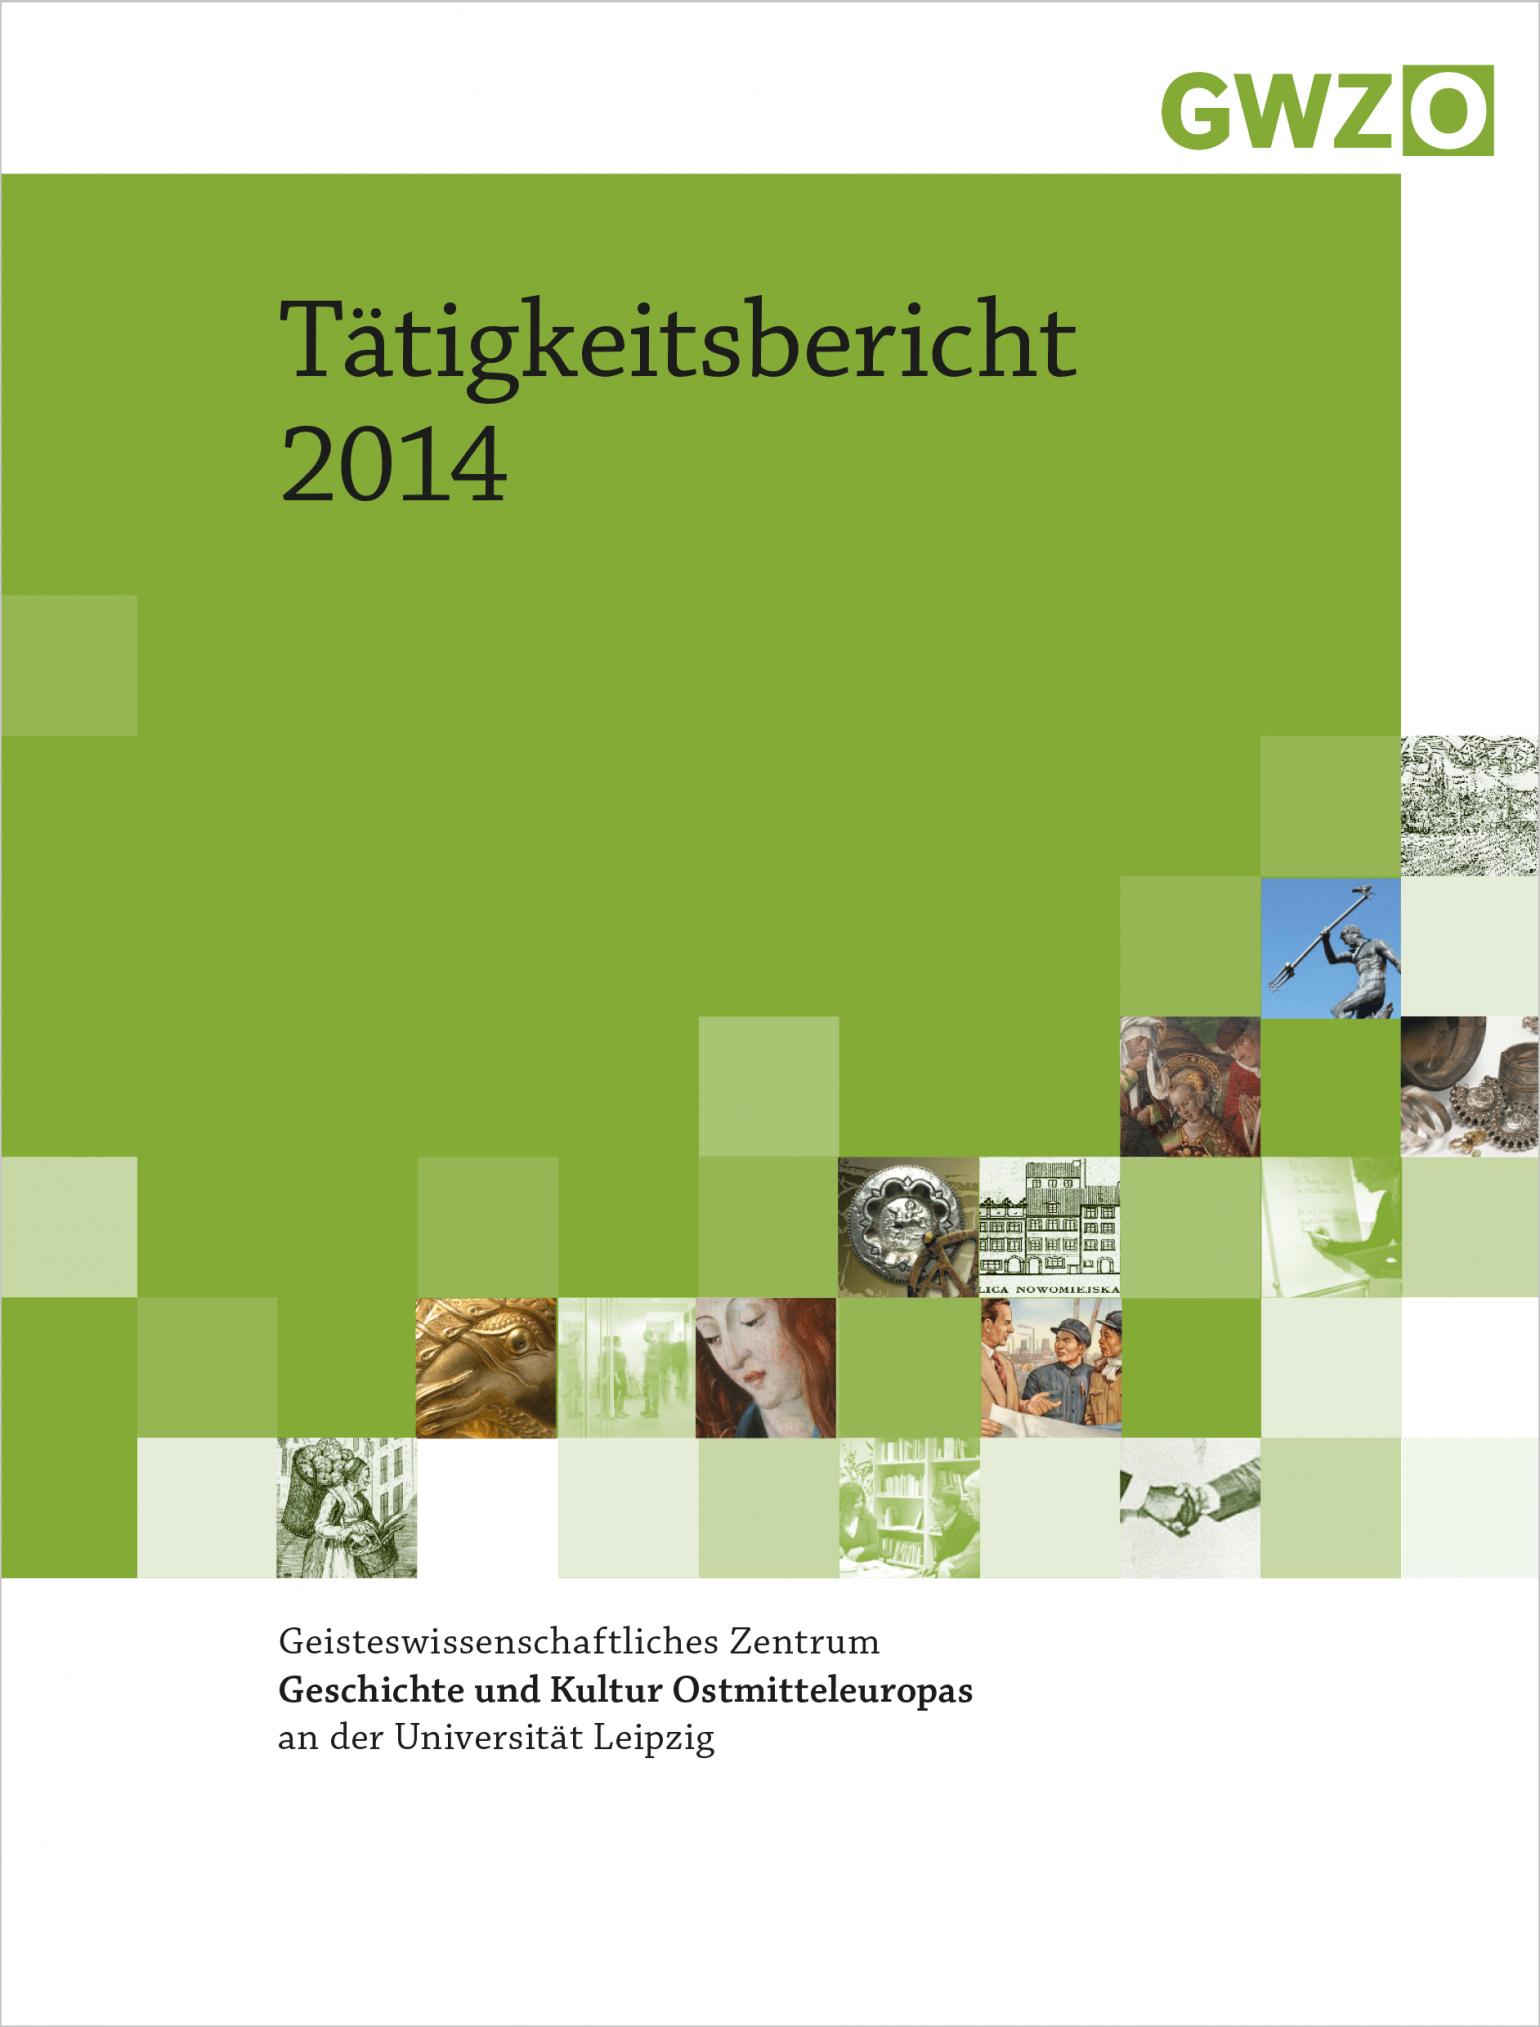 2016-gwzo-tb-cover